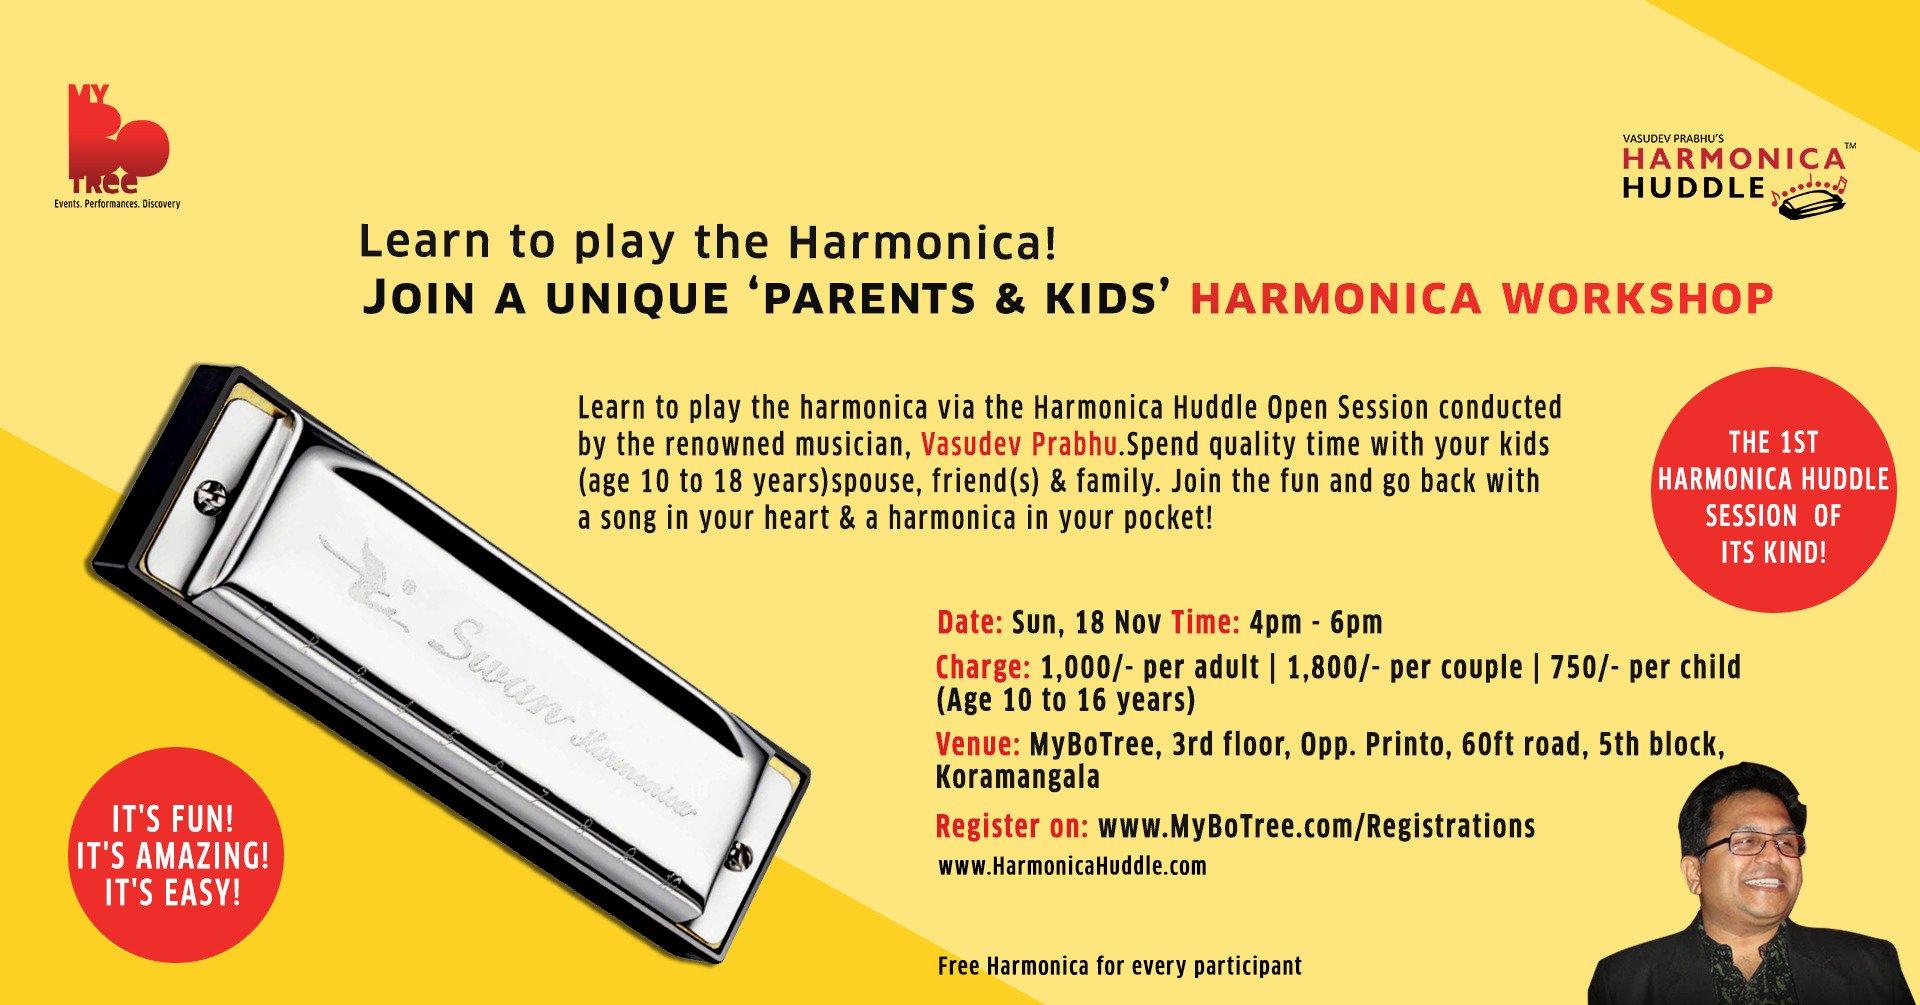 Harmonica Huddle